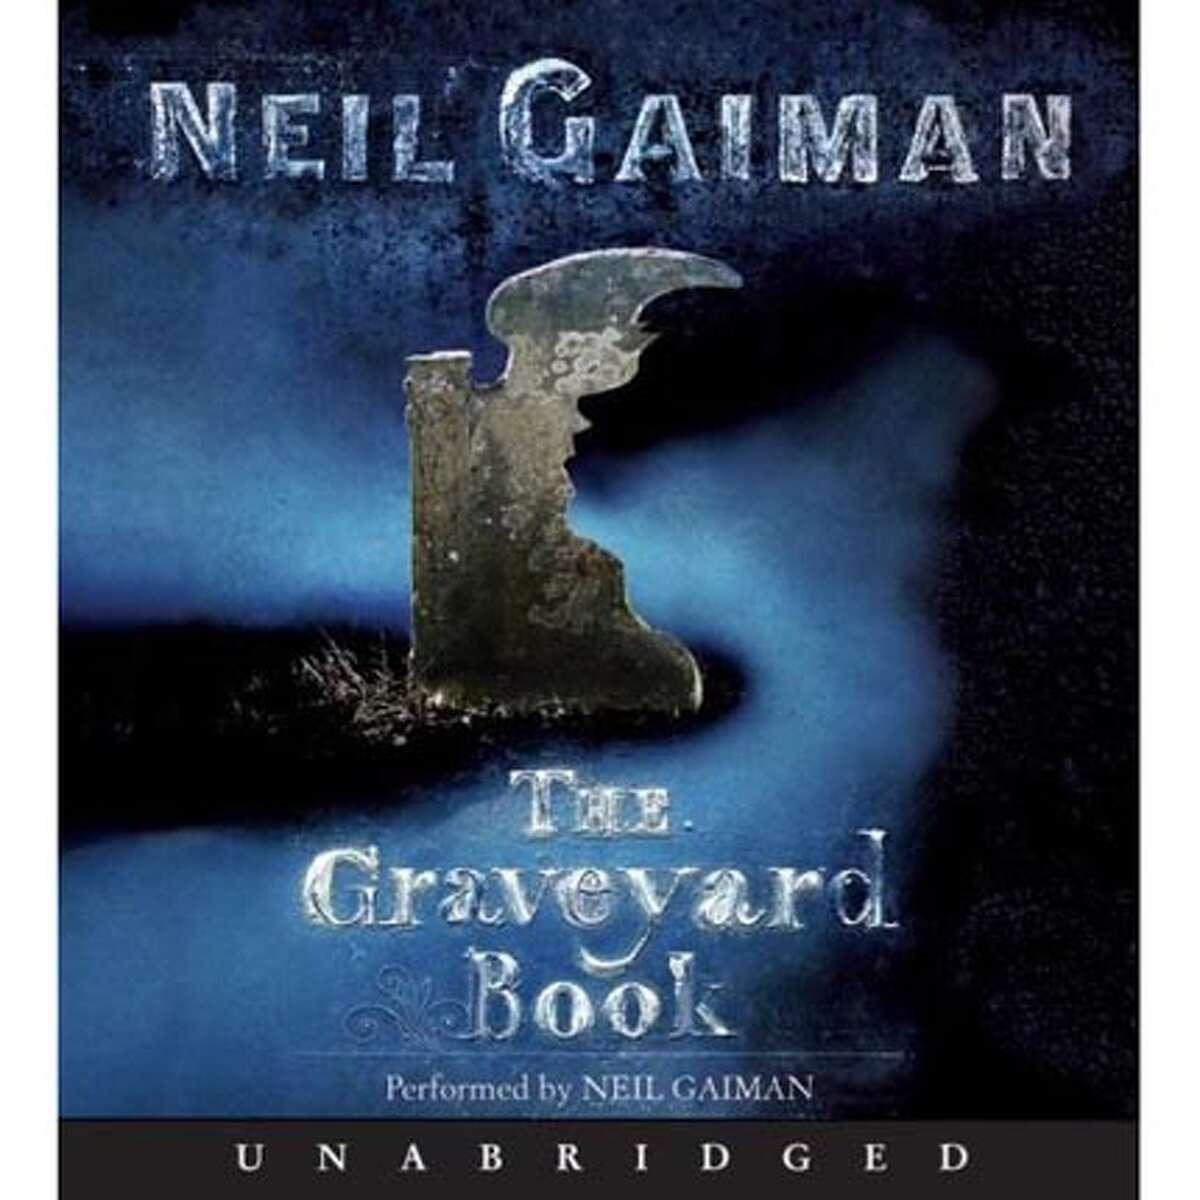 'The Graveyard Book' by Neil Gaiman